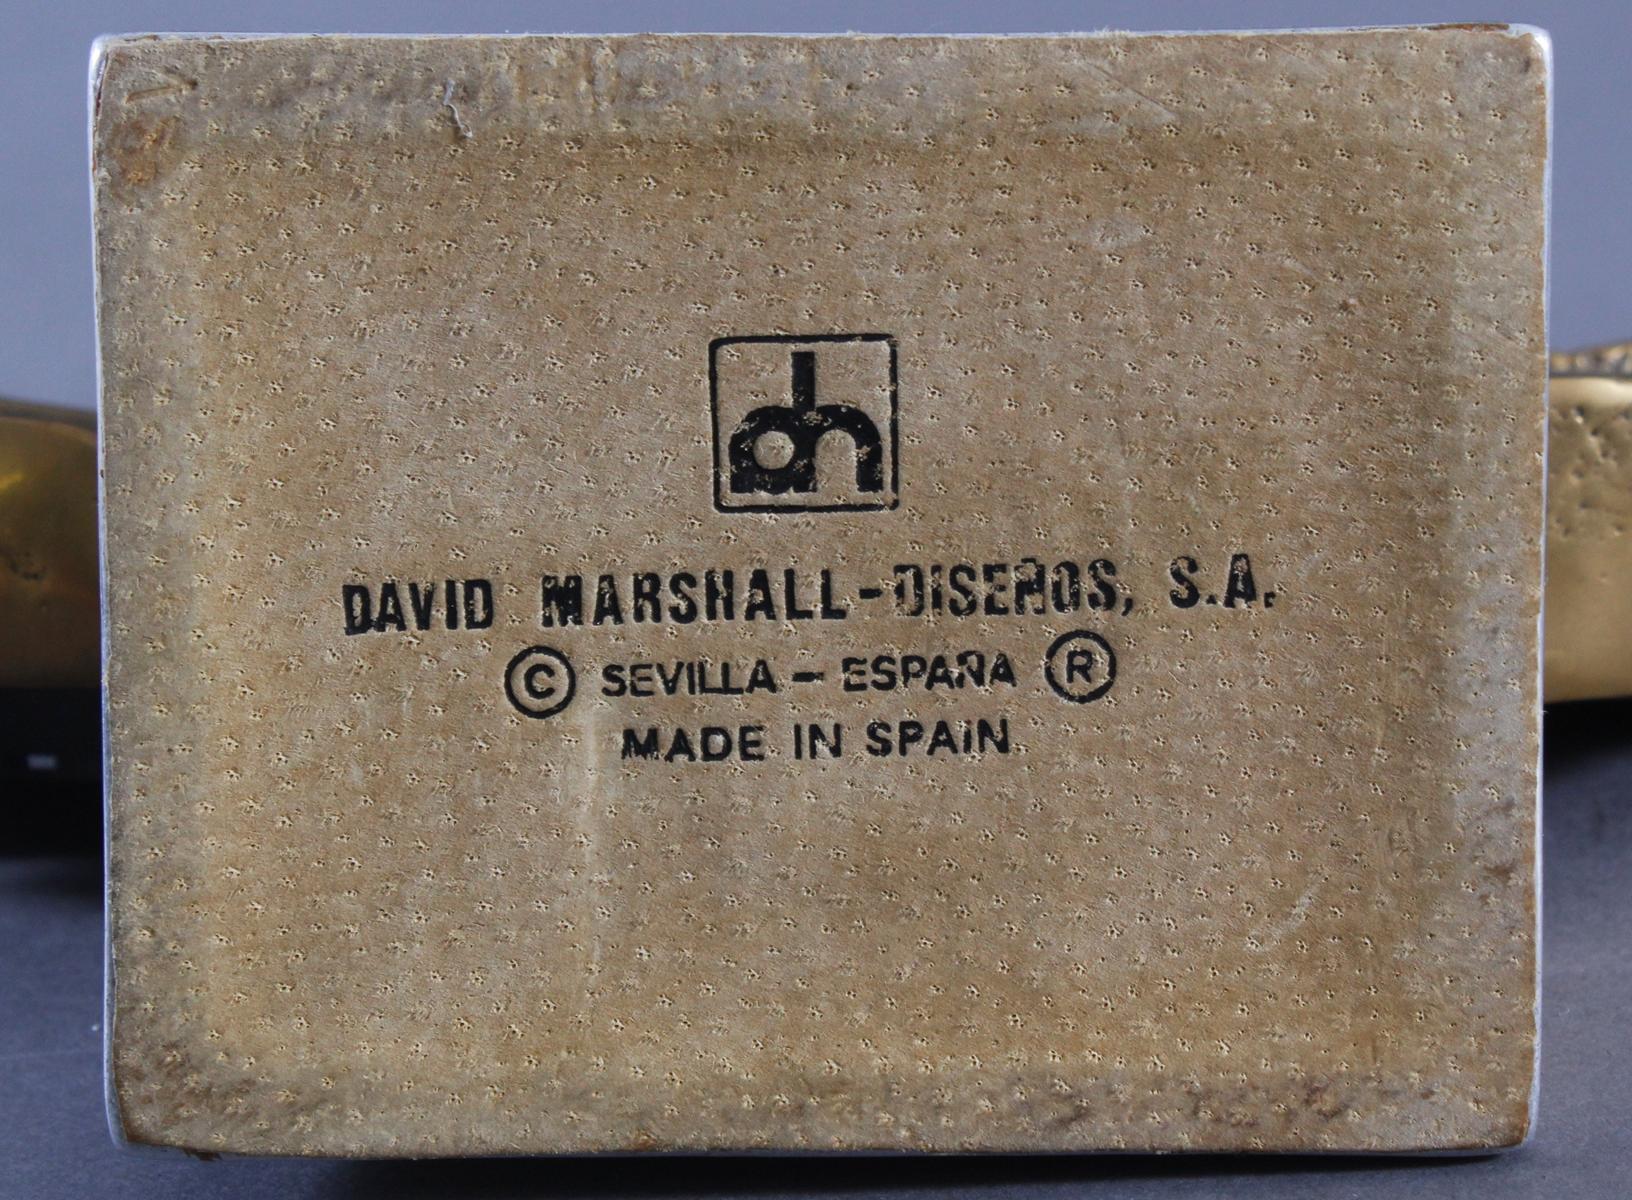 David Marshall (1942). Kaminuhr-5